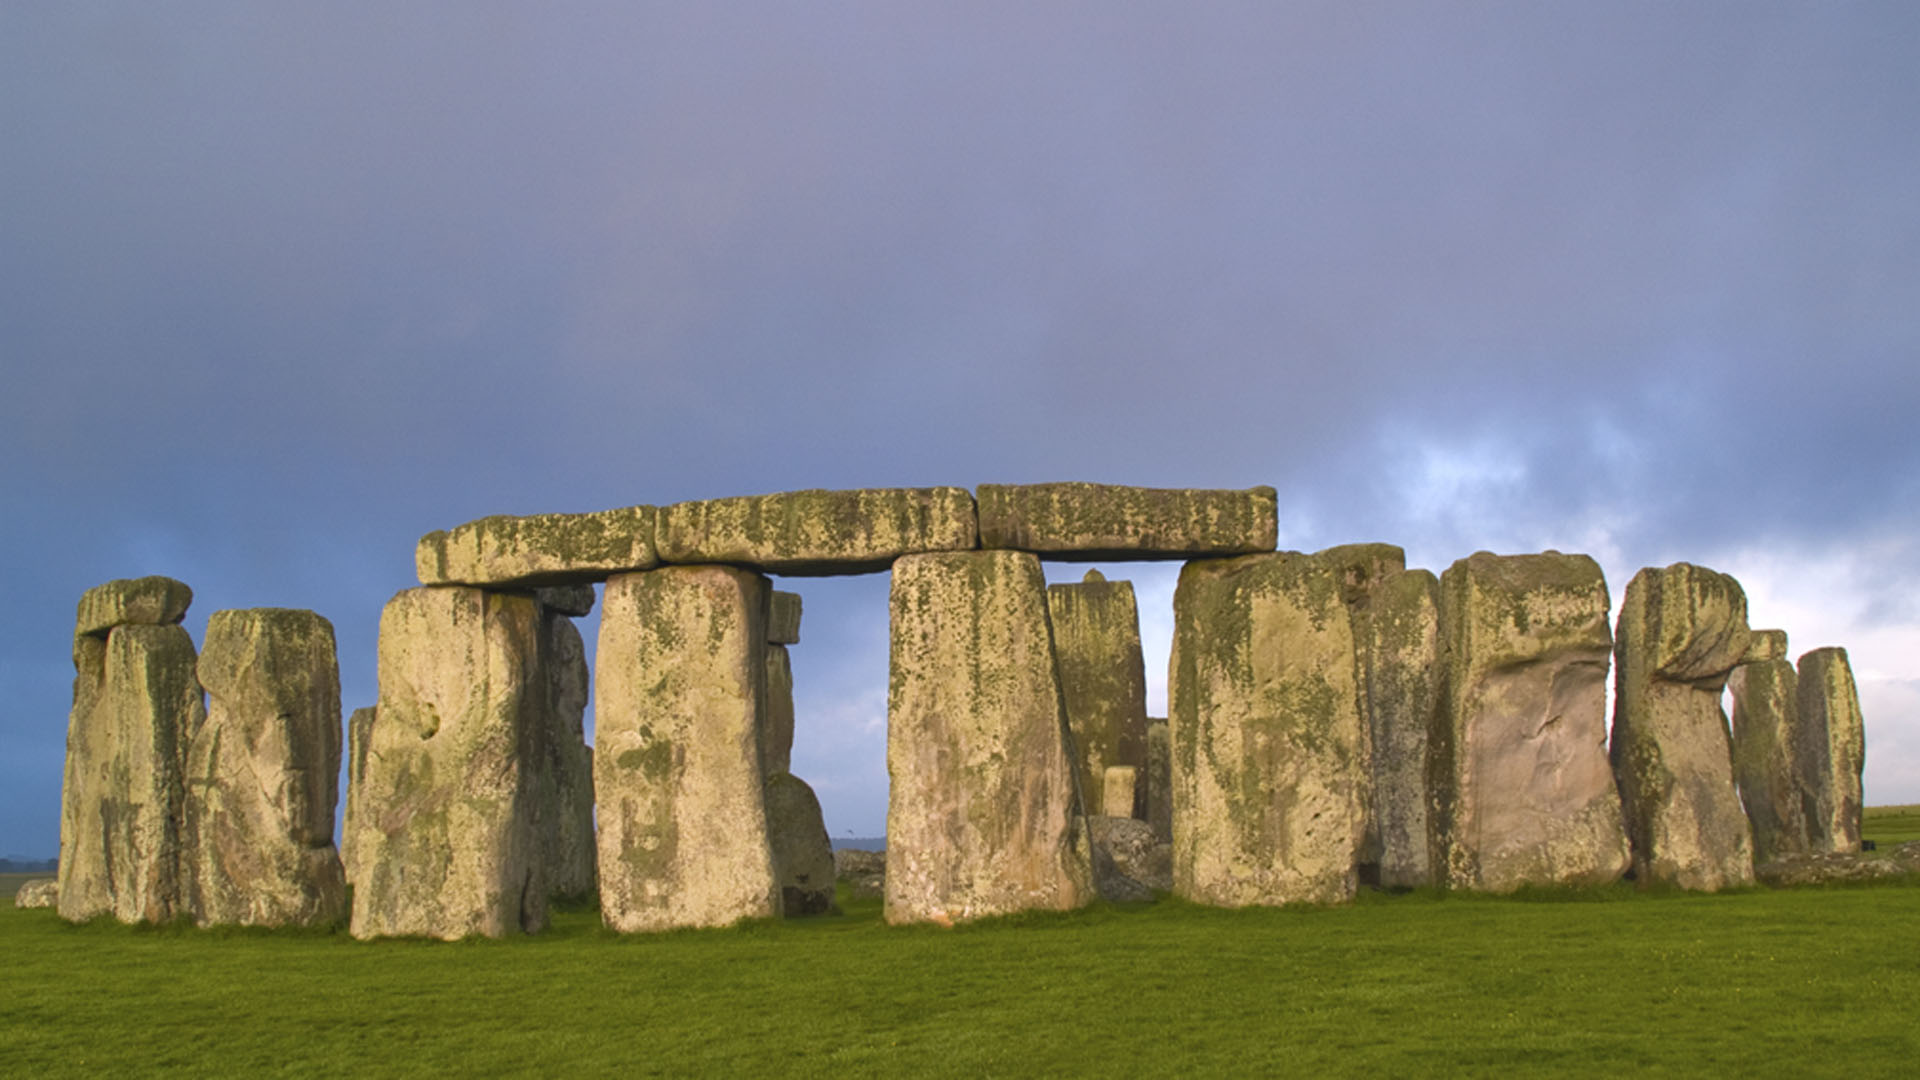 Famous Rock Group, Stonehenge, Wiltshire, England  № 715543 загрузить